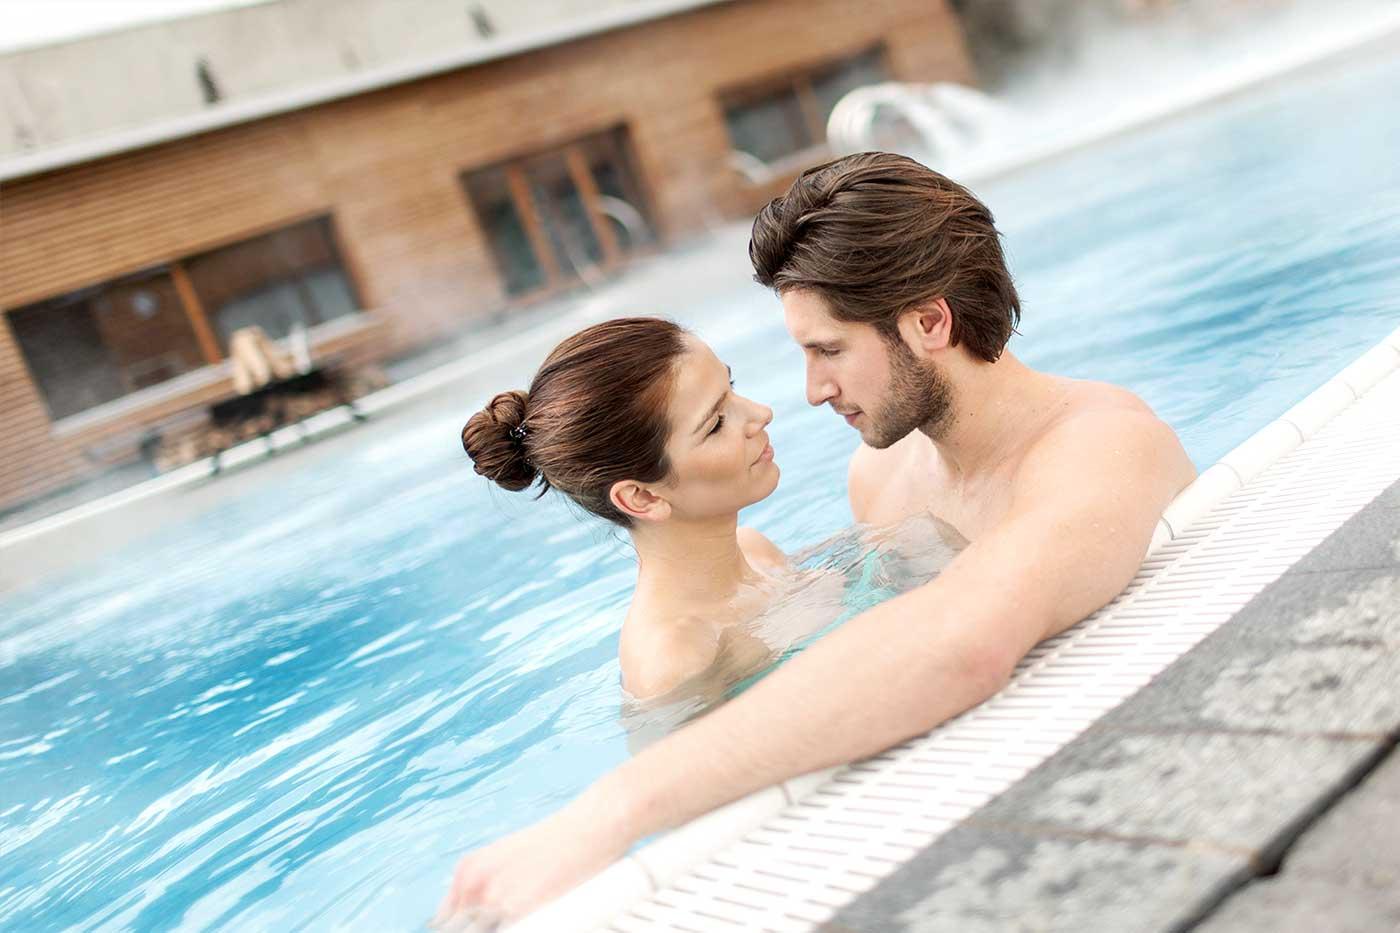 aquabasilea-saunawelt-relaxpools-03